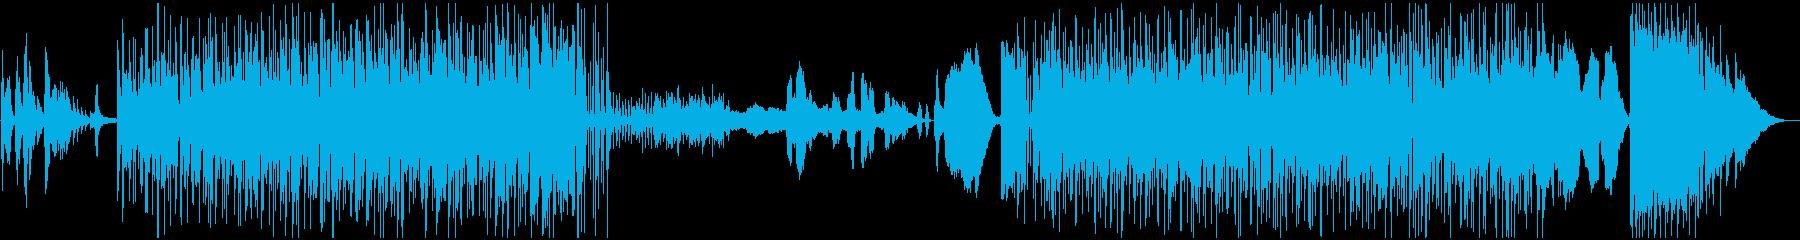 Klezmerisch rhumb...の再生済みの波形